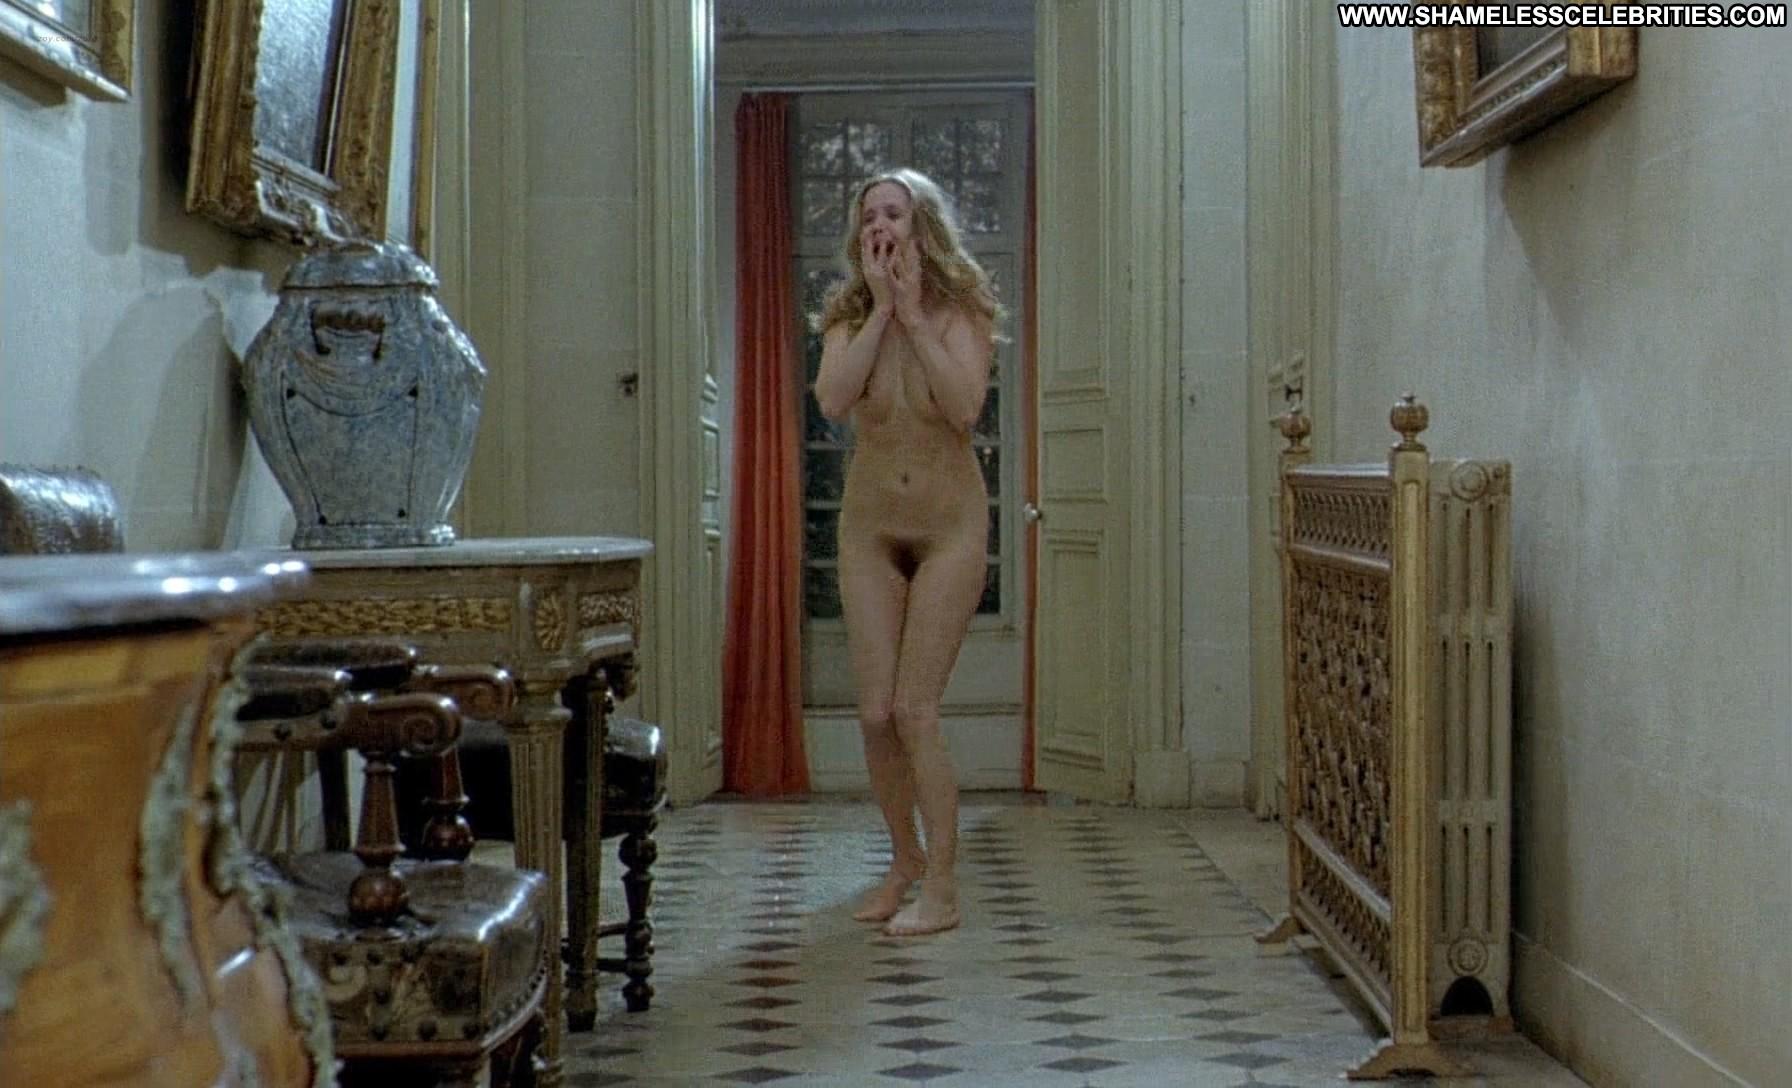 Sirpa lane lisbeth hummel nude scenes from the beast - 3 part 8